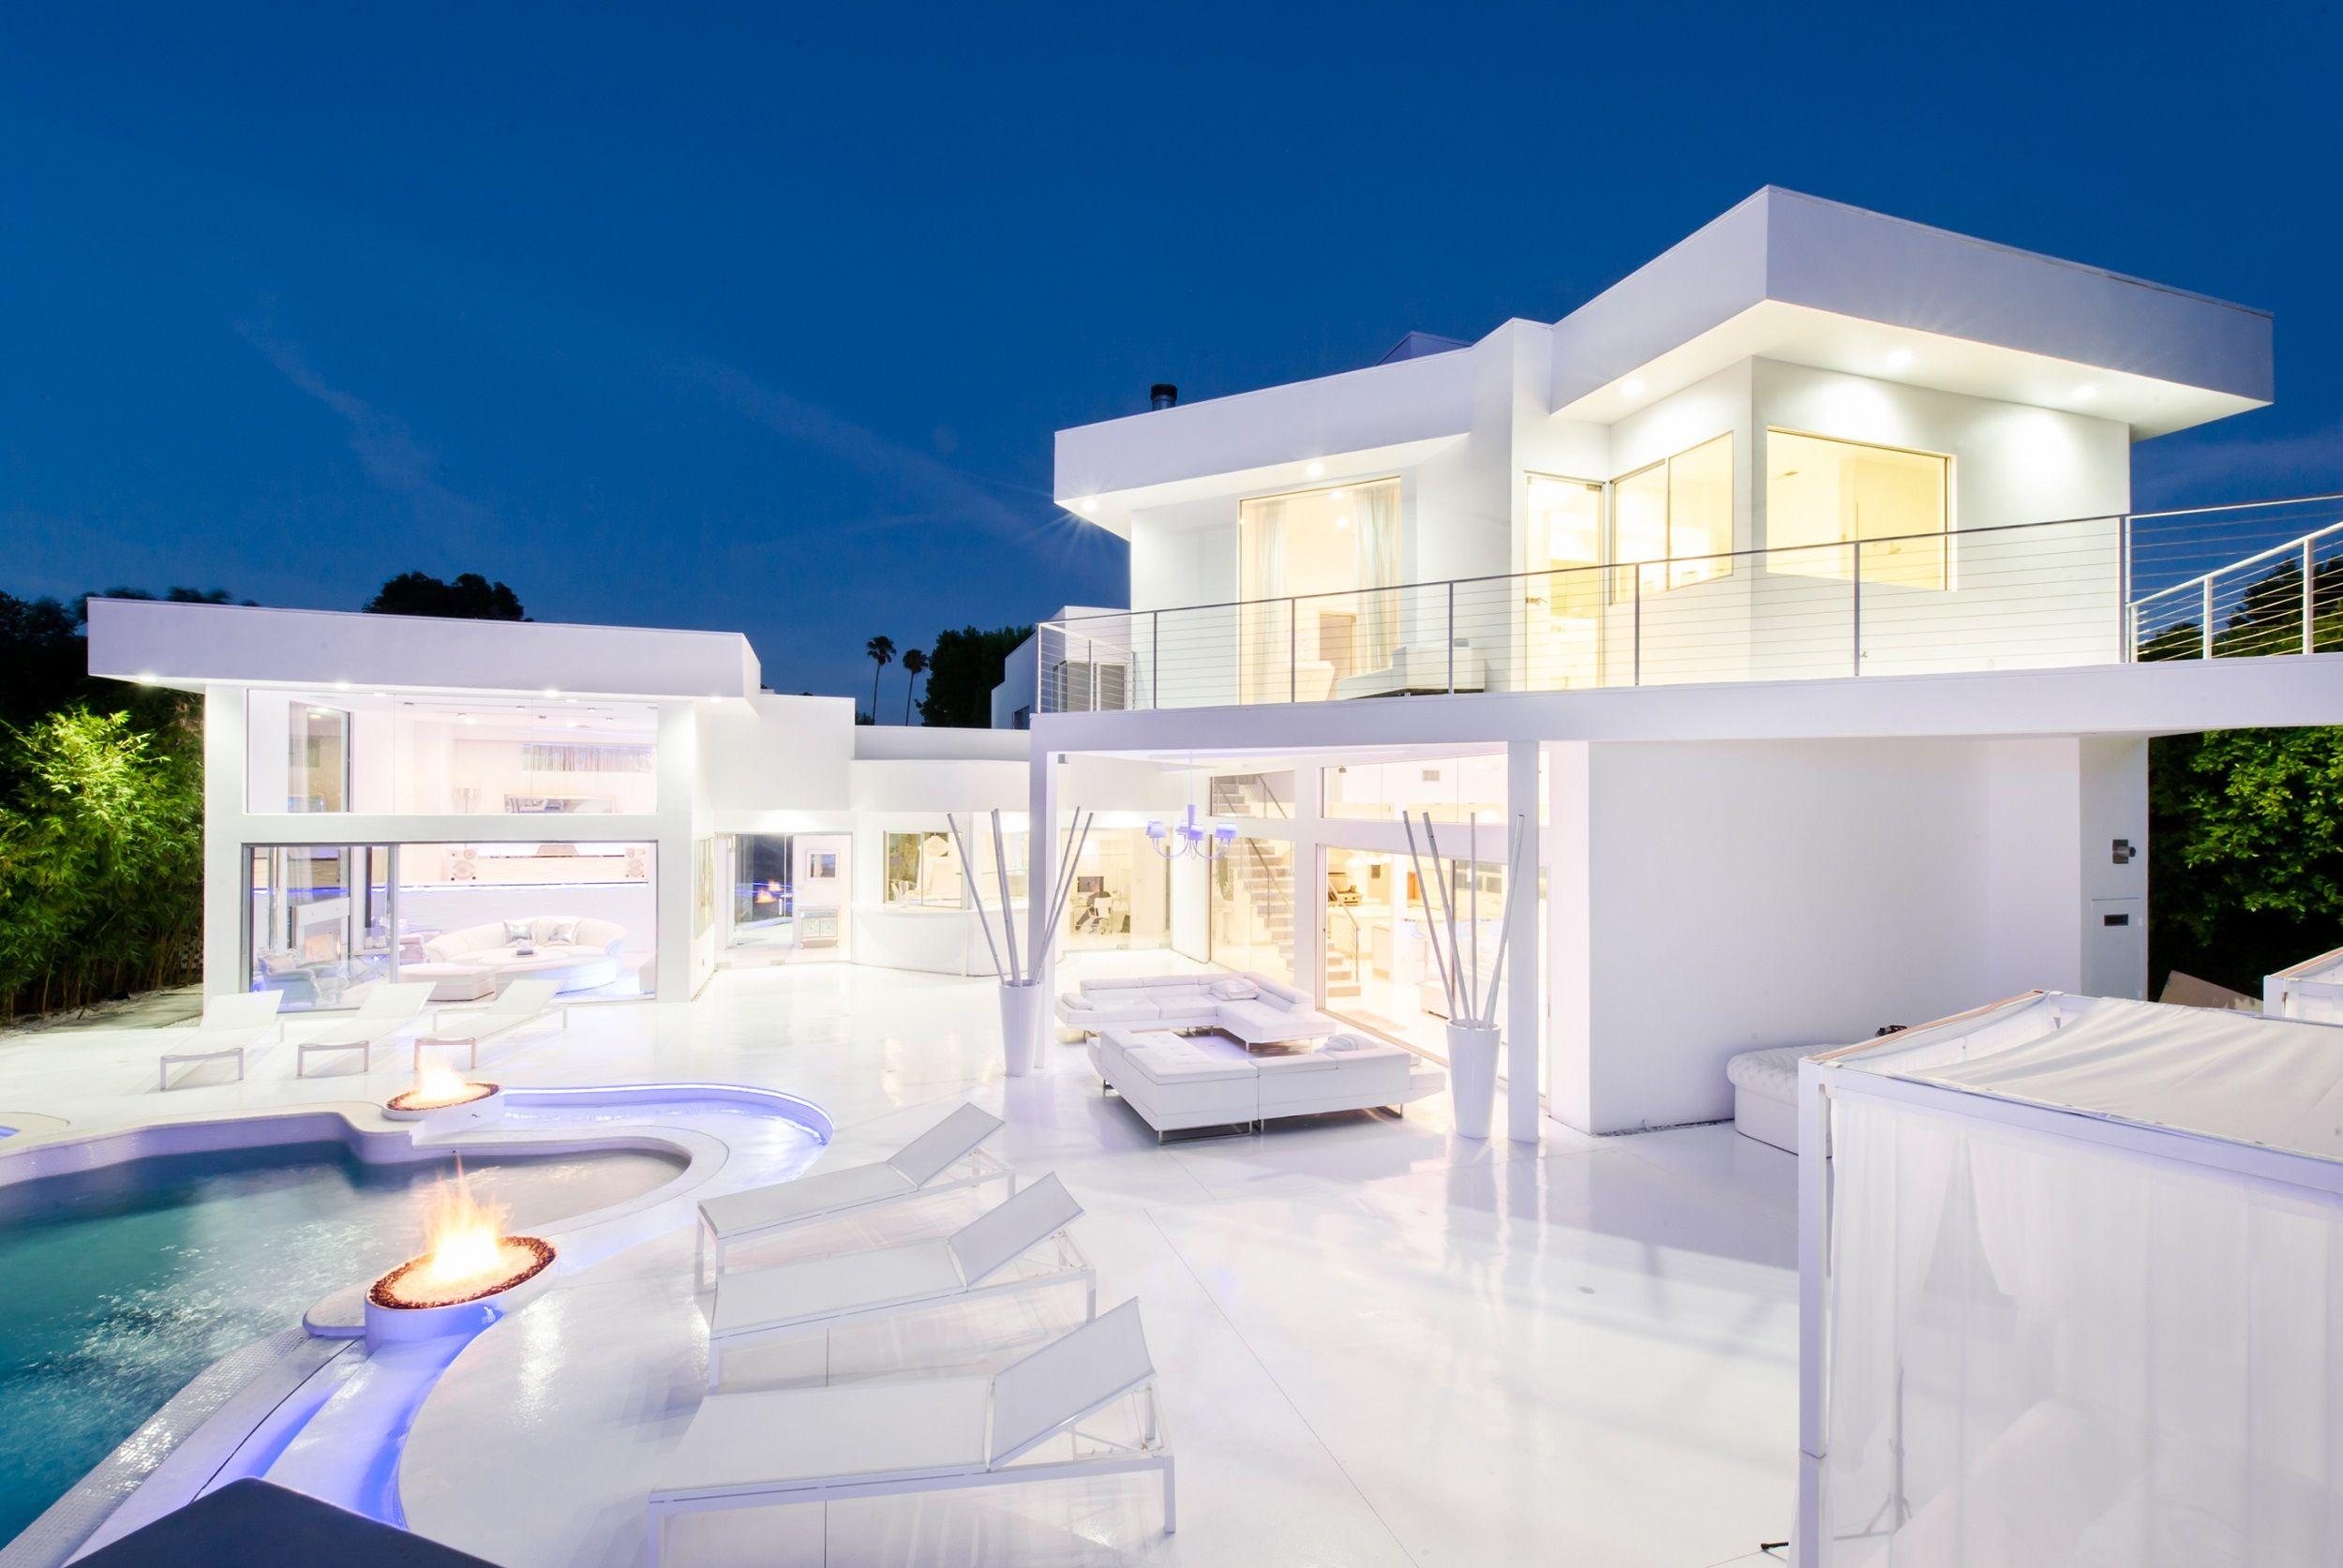 Simonds Home Designs Flinders St Ives Facade Visit Www